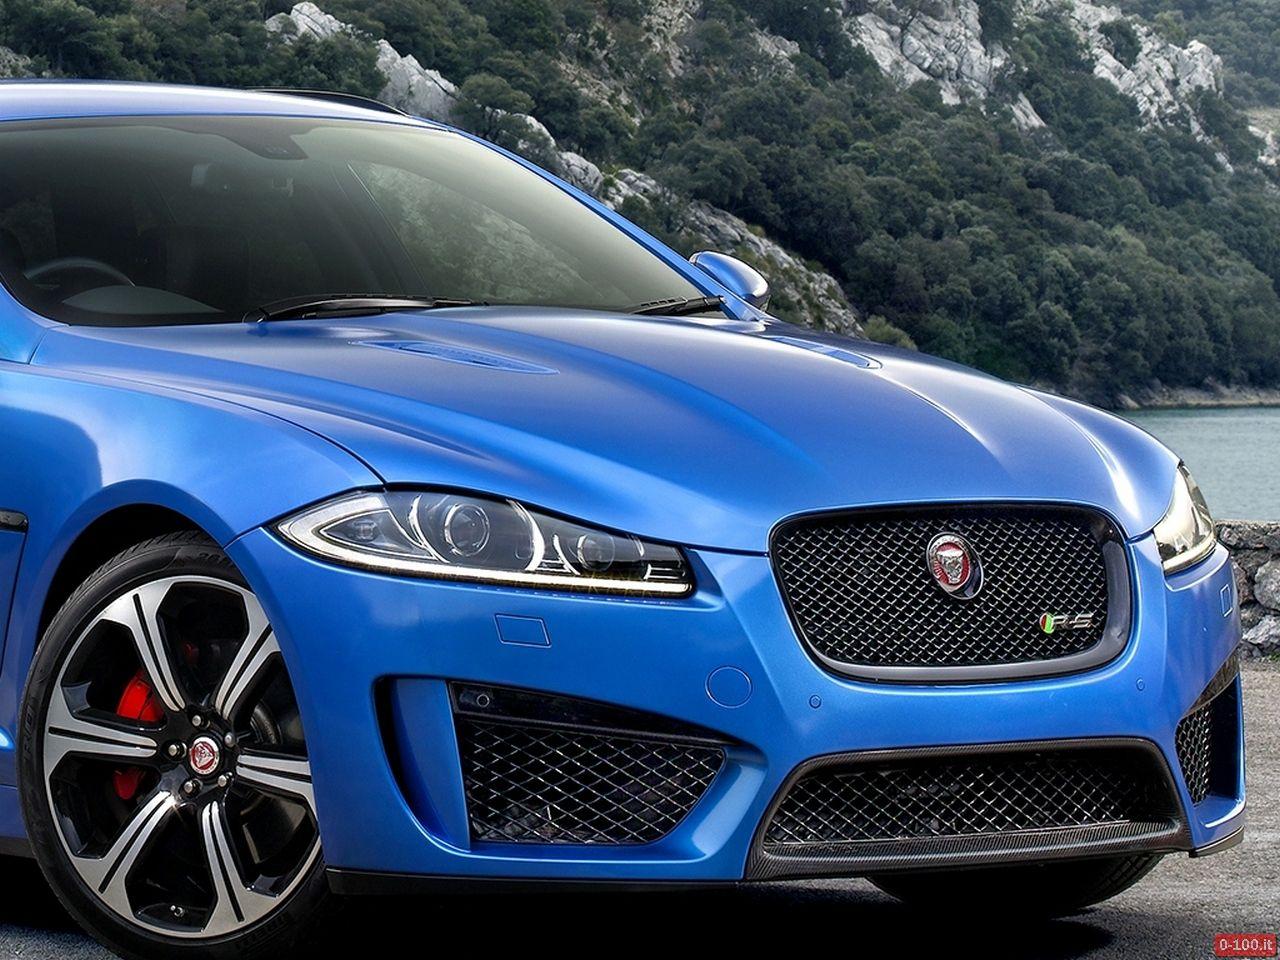 ginevra-2014-jaguar-xf-model-year-2015-xfr-s-sportbrake-0-100_3